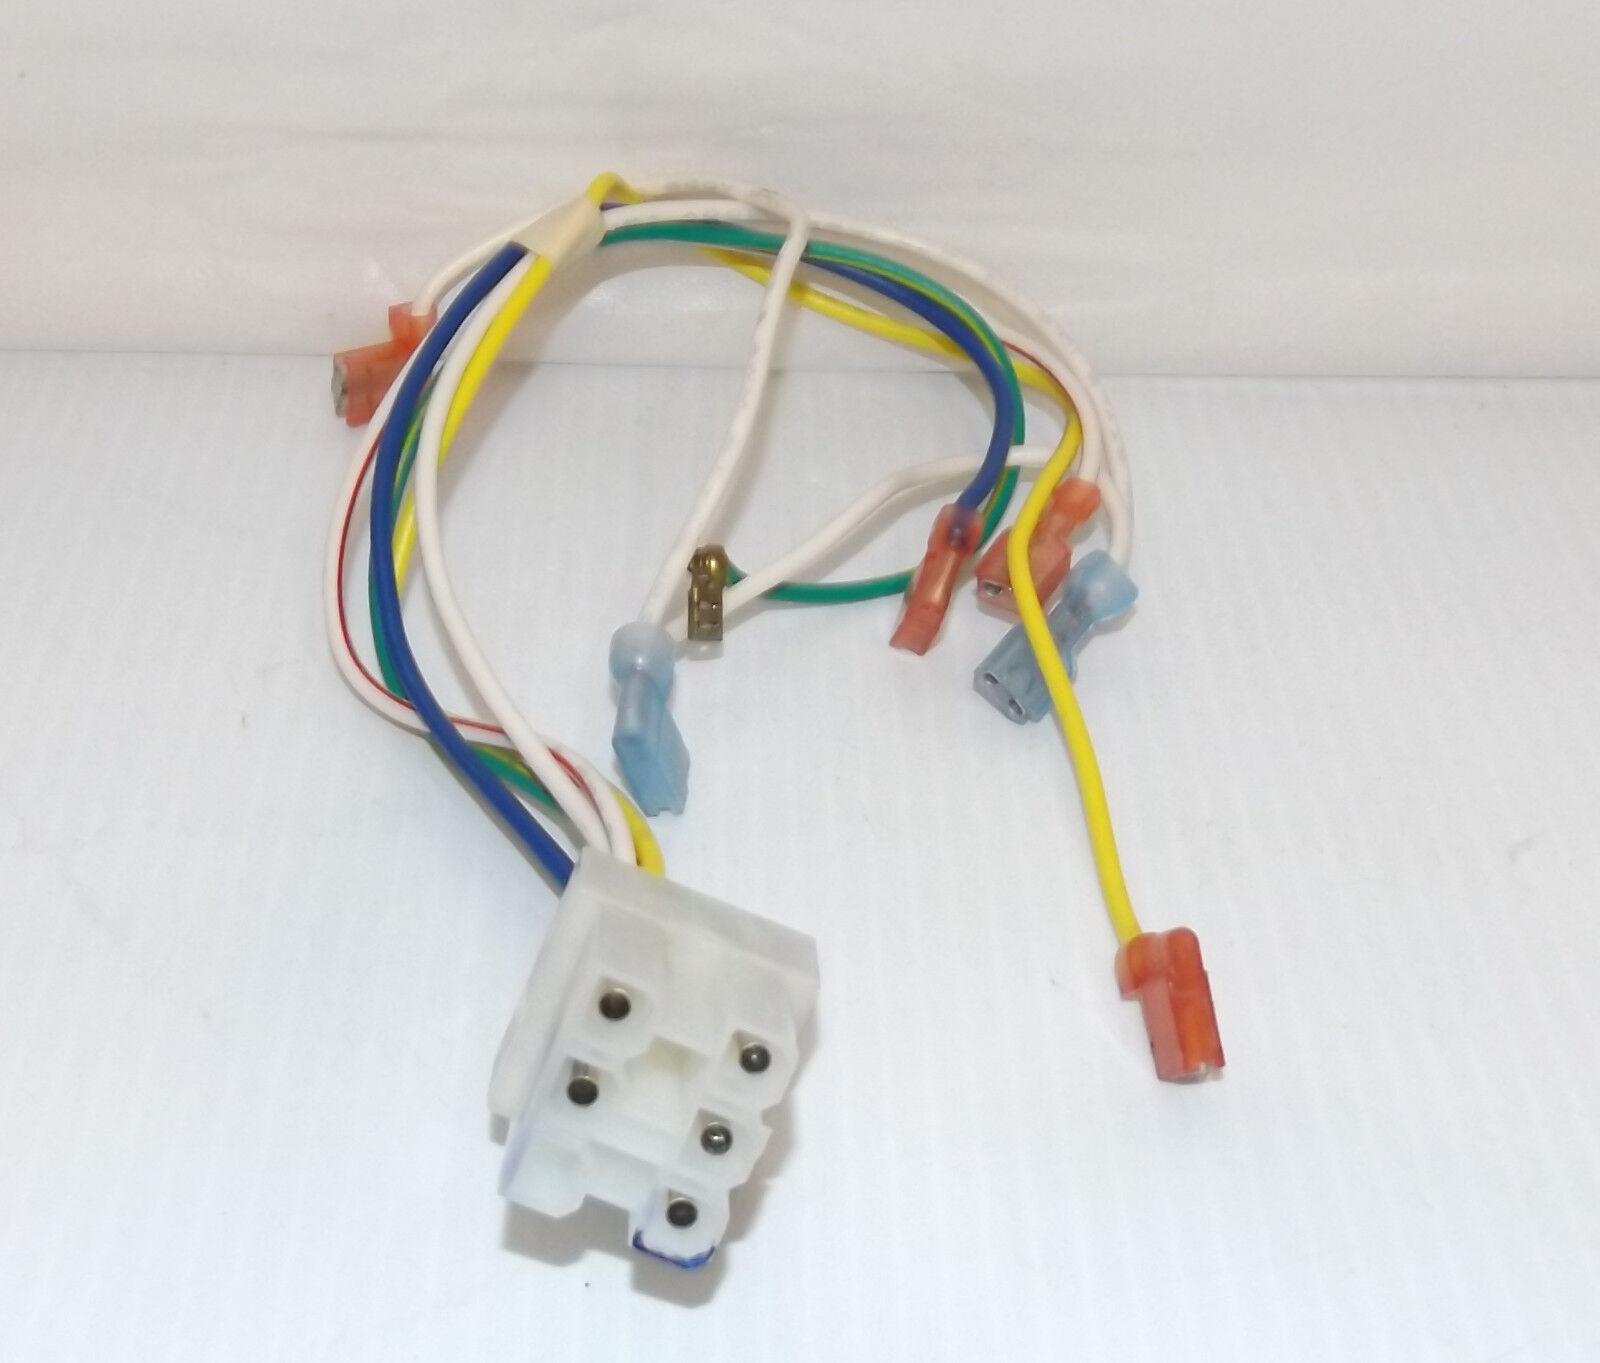 Ultima Wiring Harness Diagram360 504 Wire Data Schema 15813453 1581561180 15815952 Sewing Machine Threading Diagram Ice Maker Silhouette Hurricane Portal Rh Banyan Palace Com